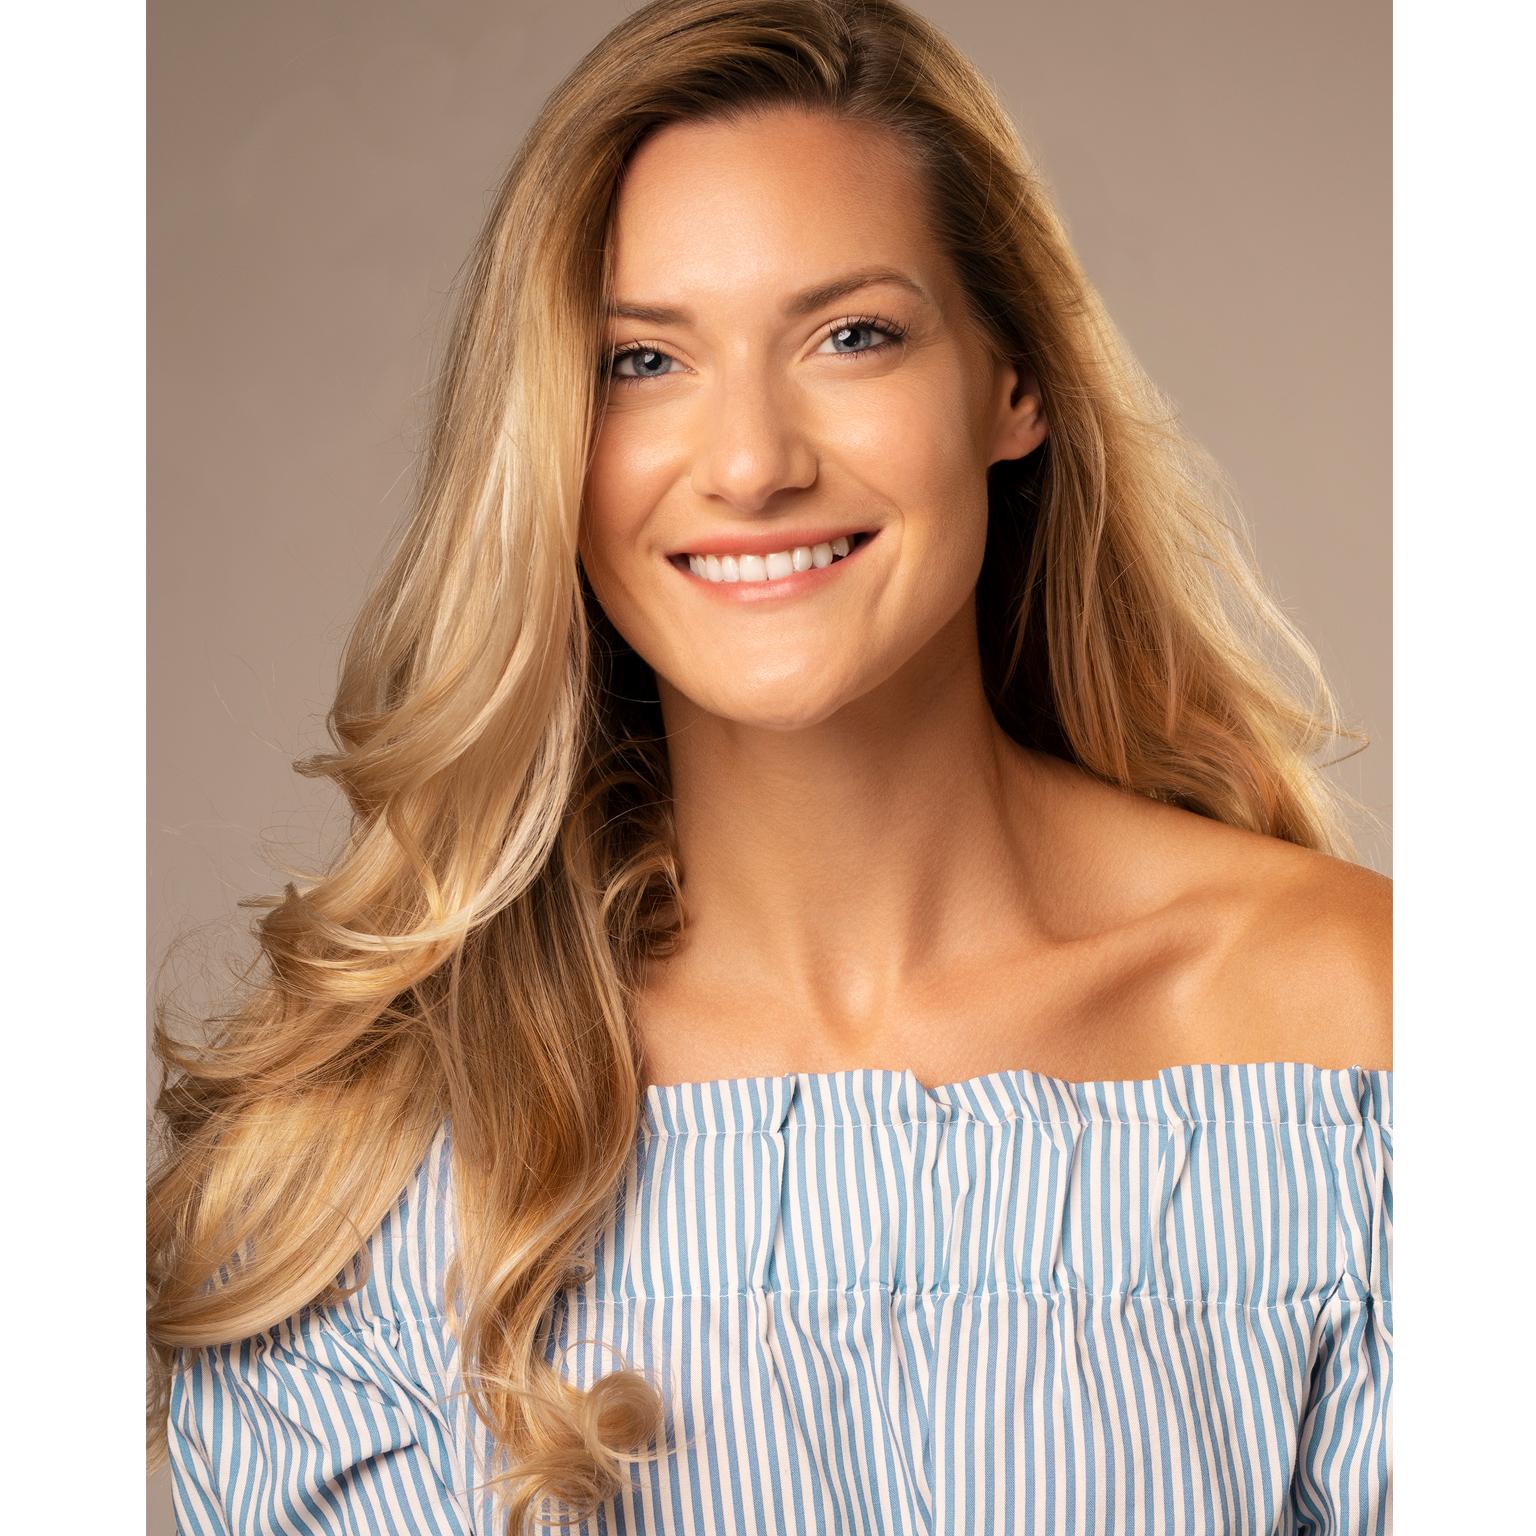 Toronto-Fitness-Model-Agency-Headshot-Amanda-La-Magna